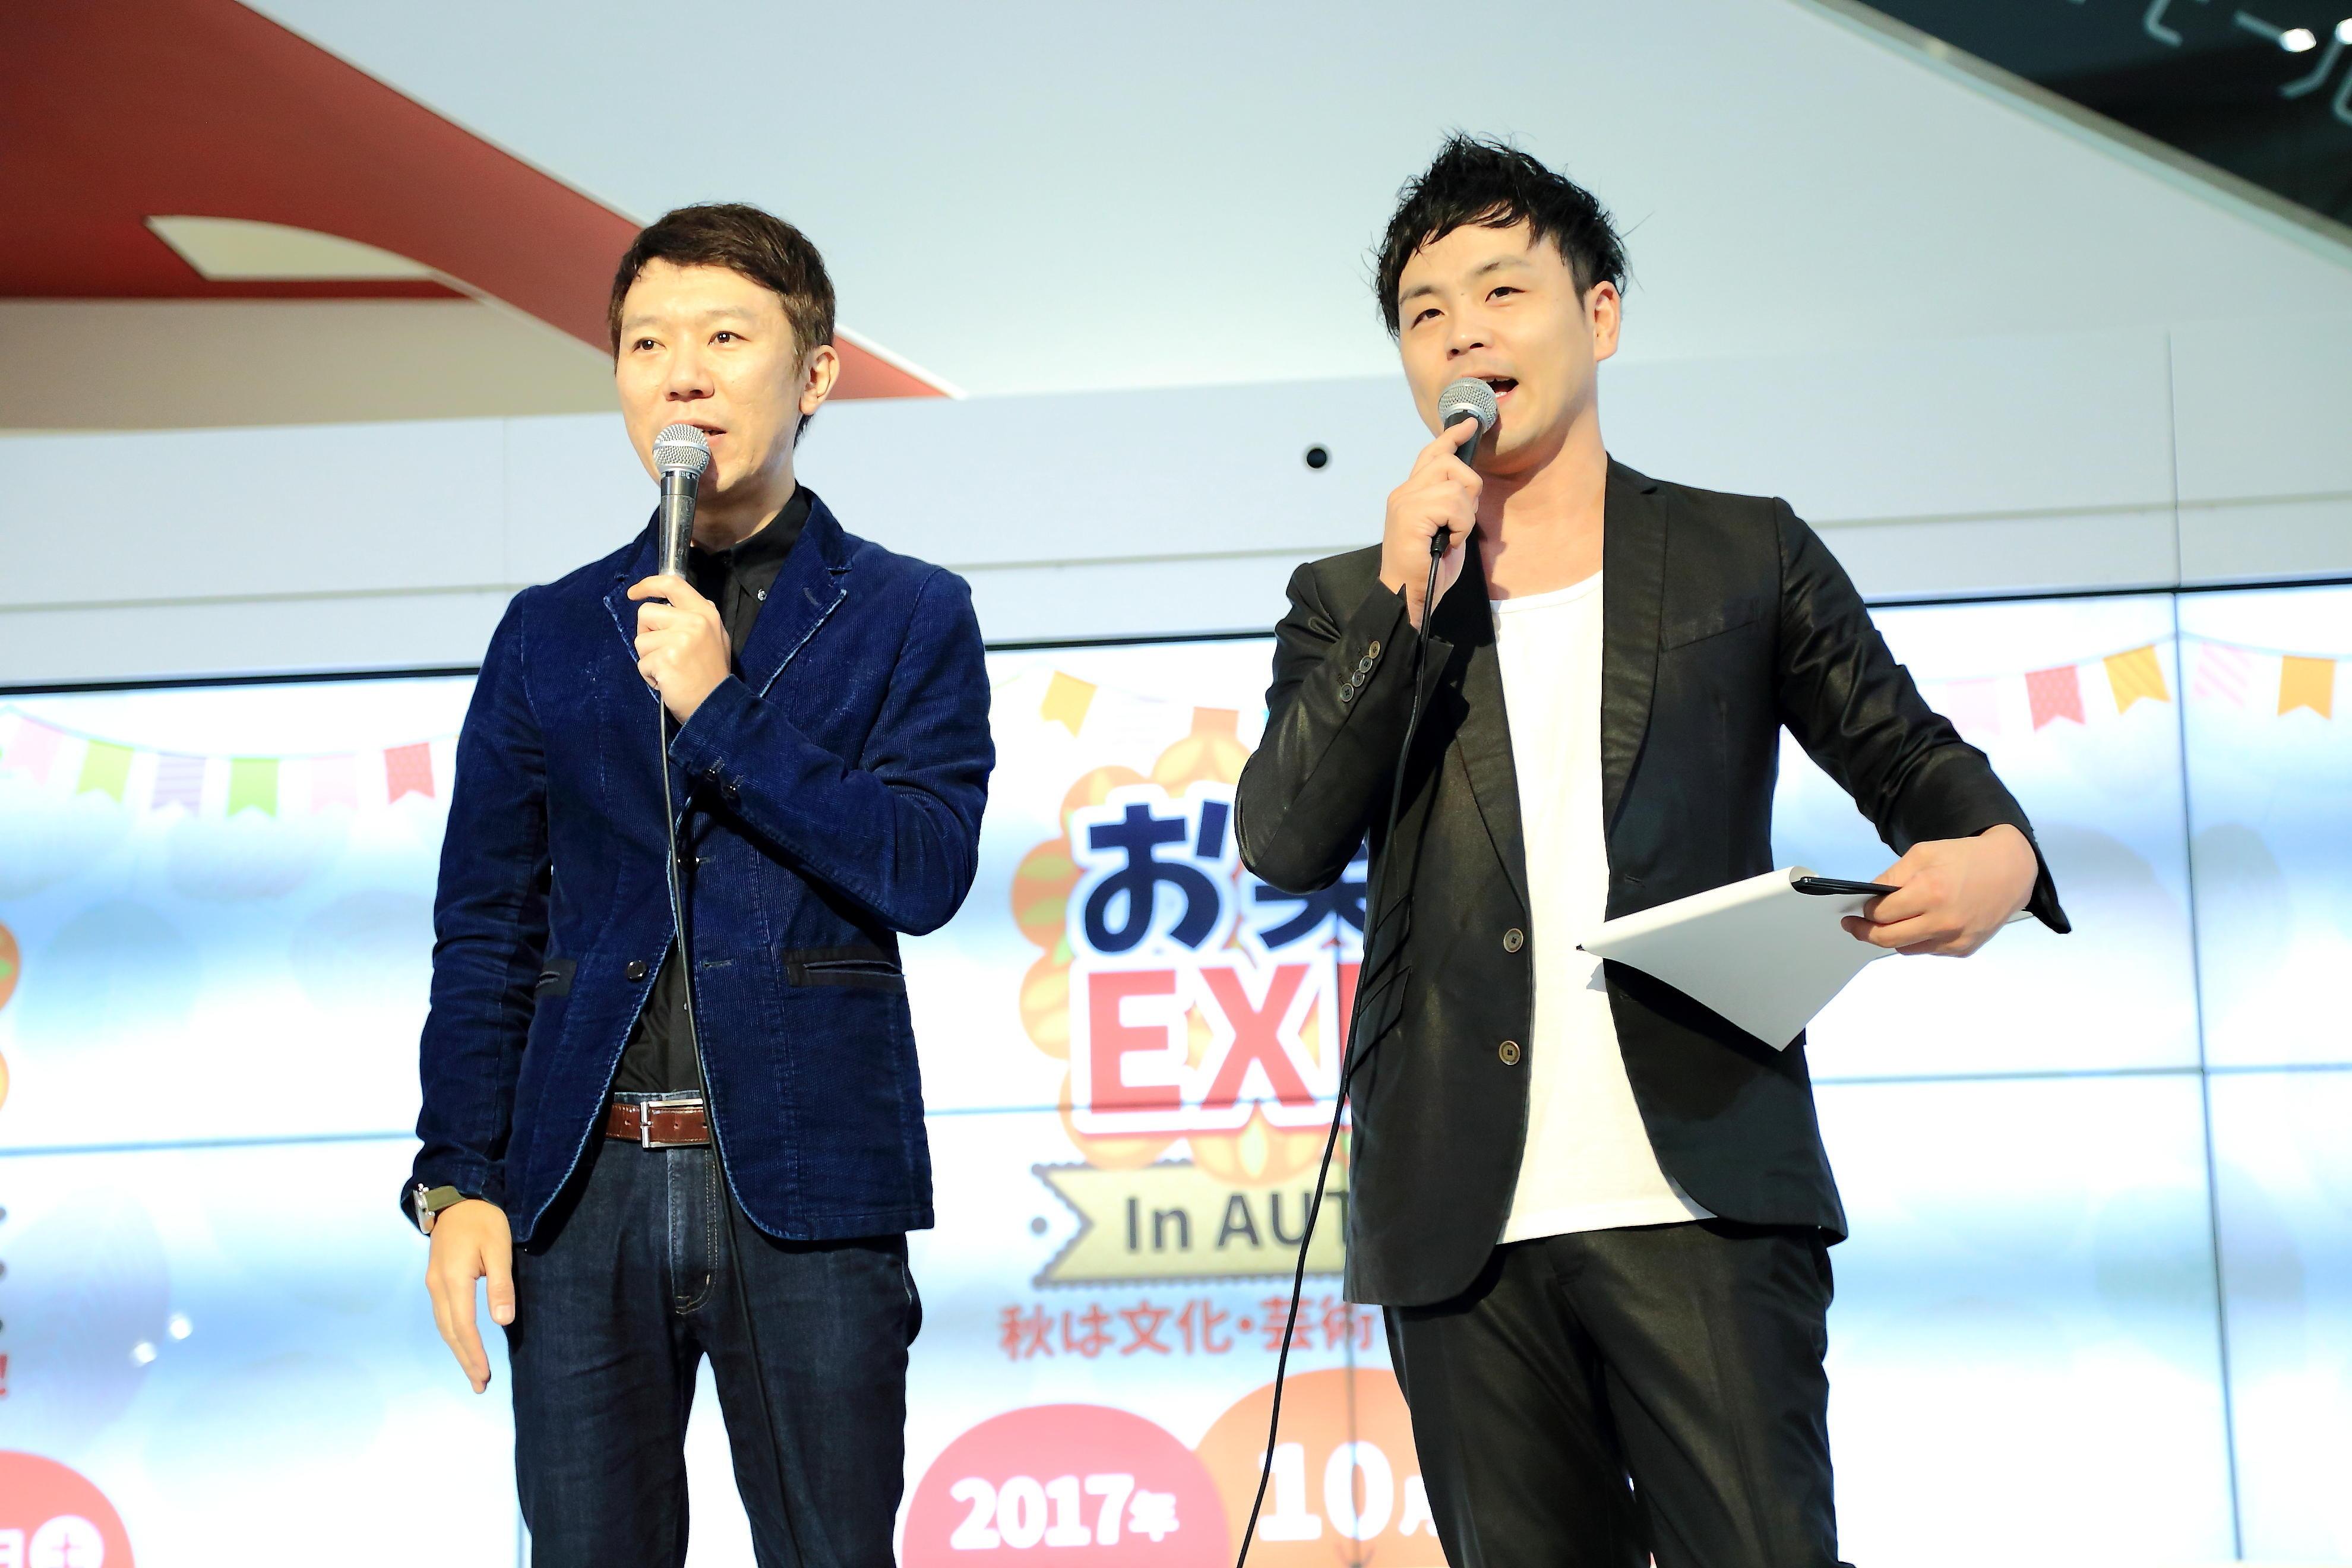 http://news.yoshimoto.co.jp/20171031230312-1db3ff6fb7bb8ba4d873690d3e3def15fbfb38ce.jpg